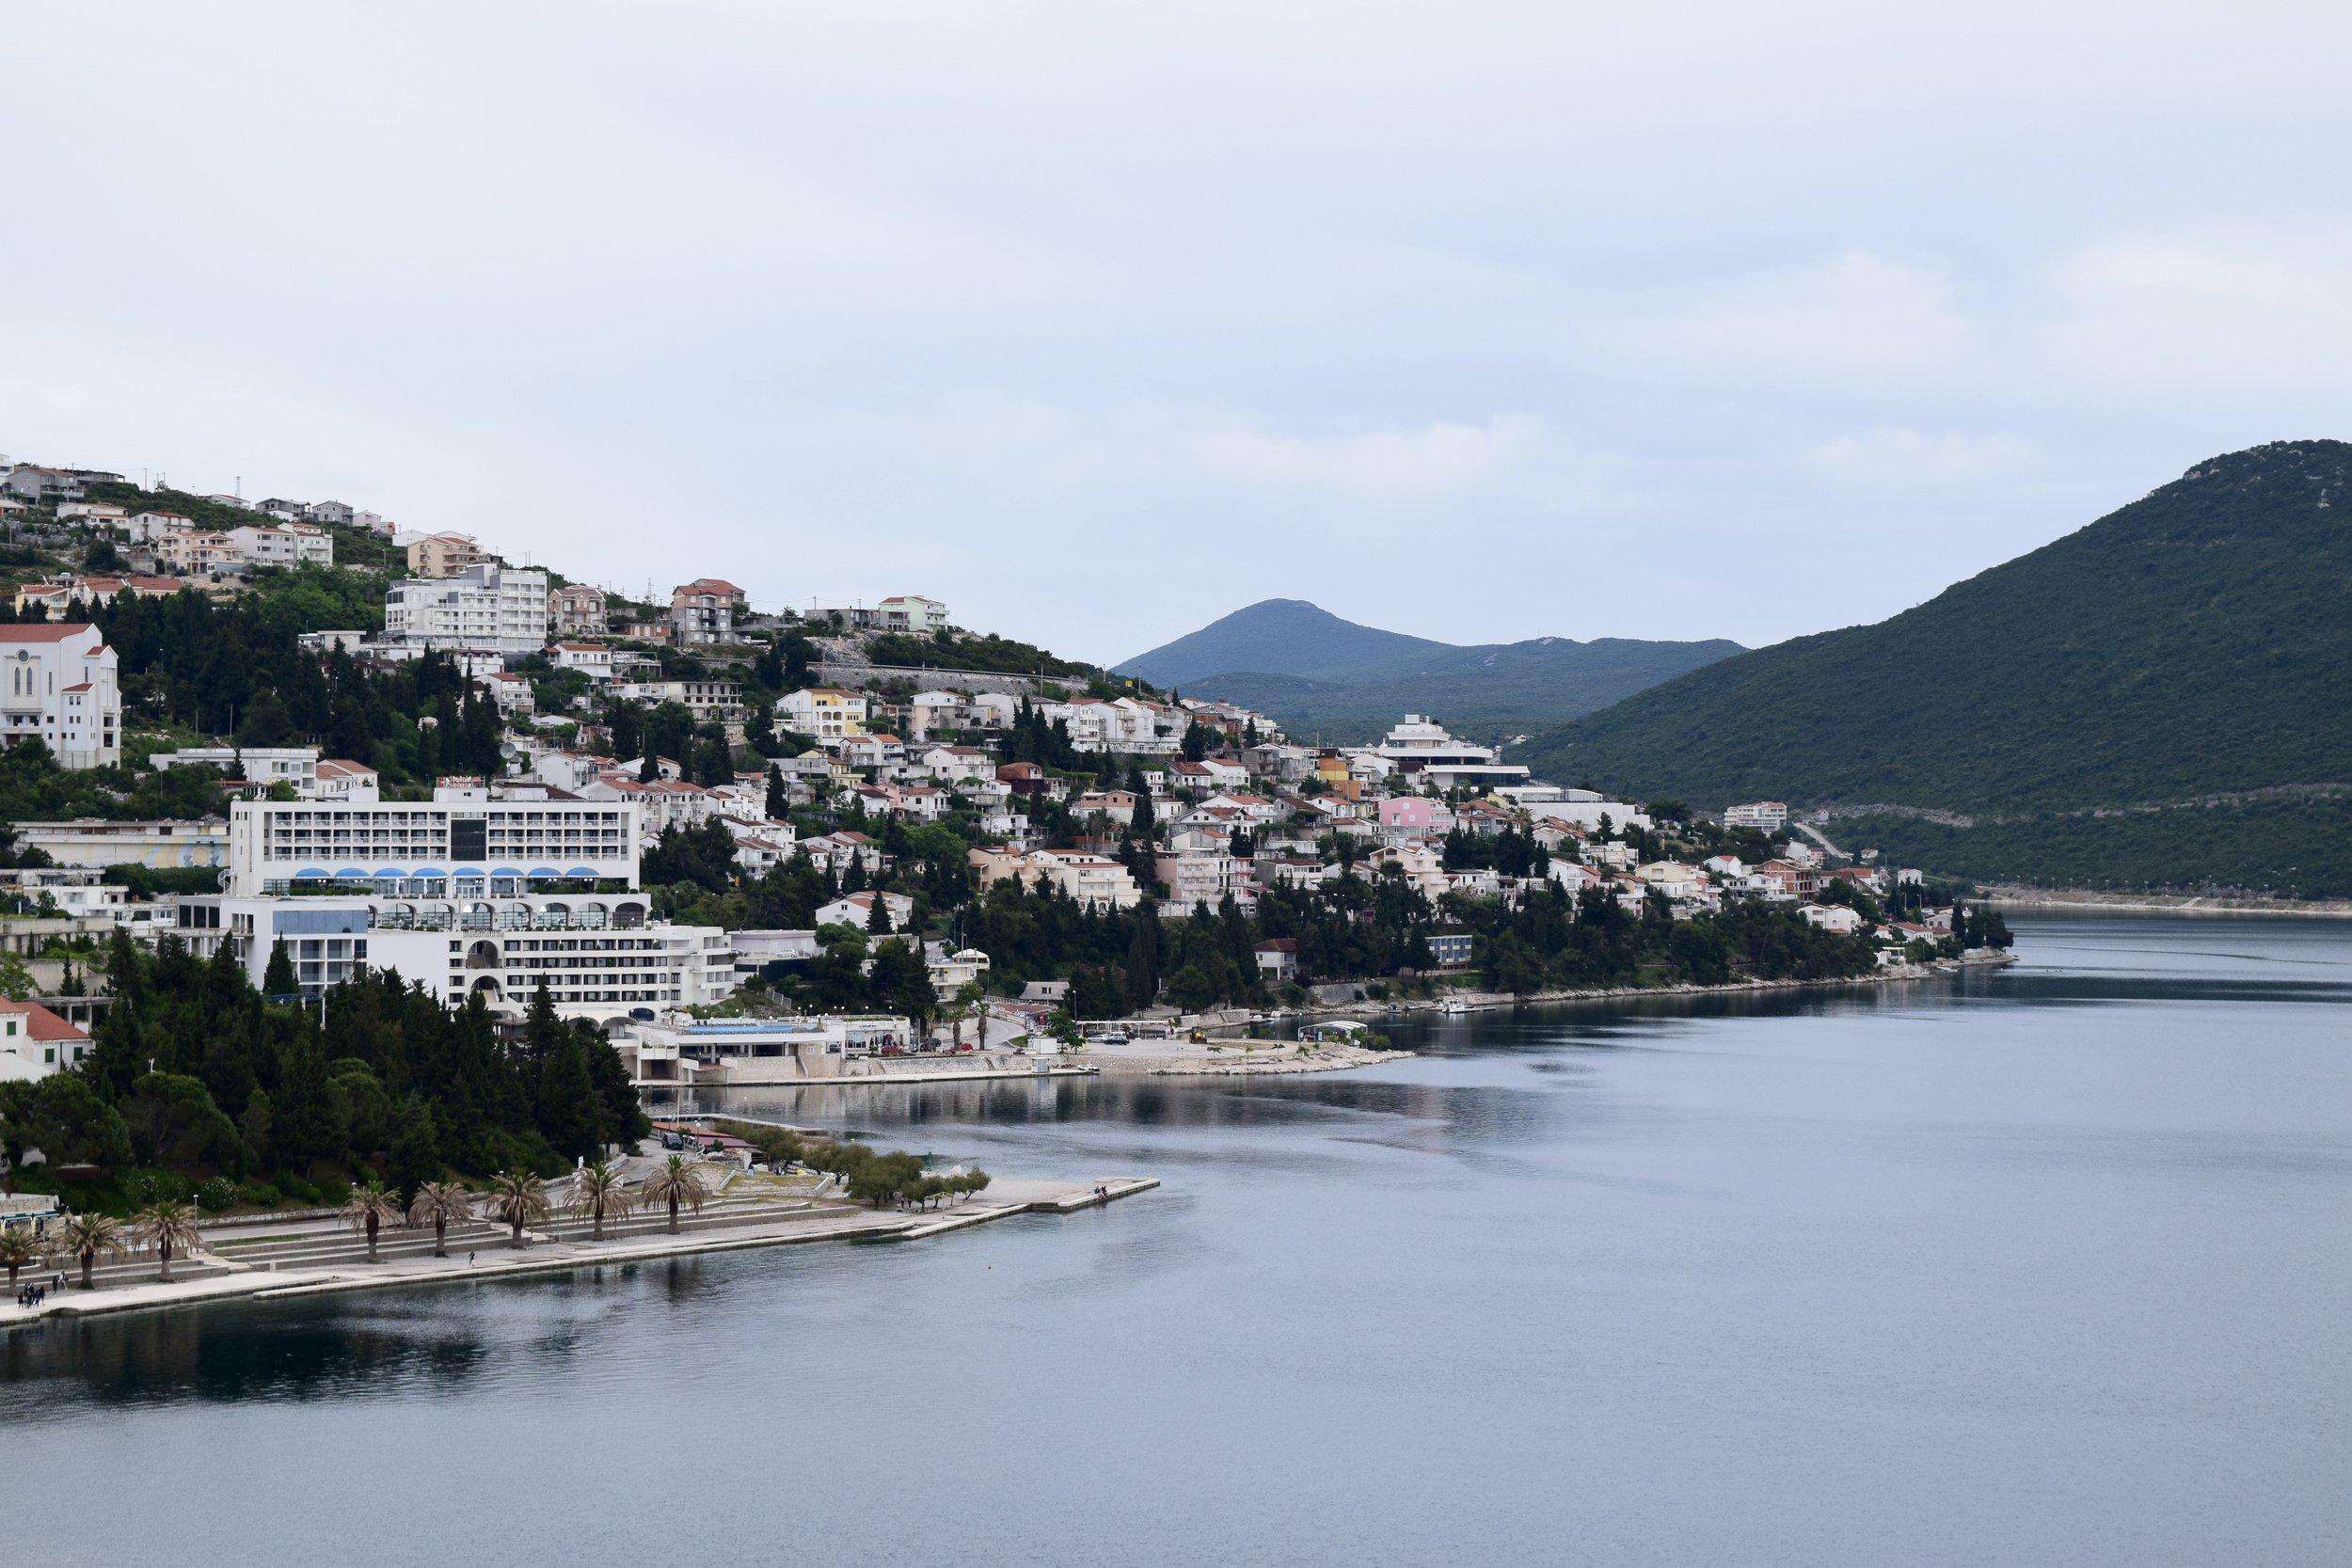 Croatian Village on the Sea